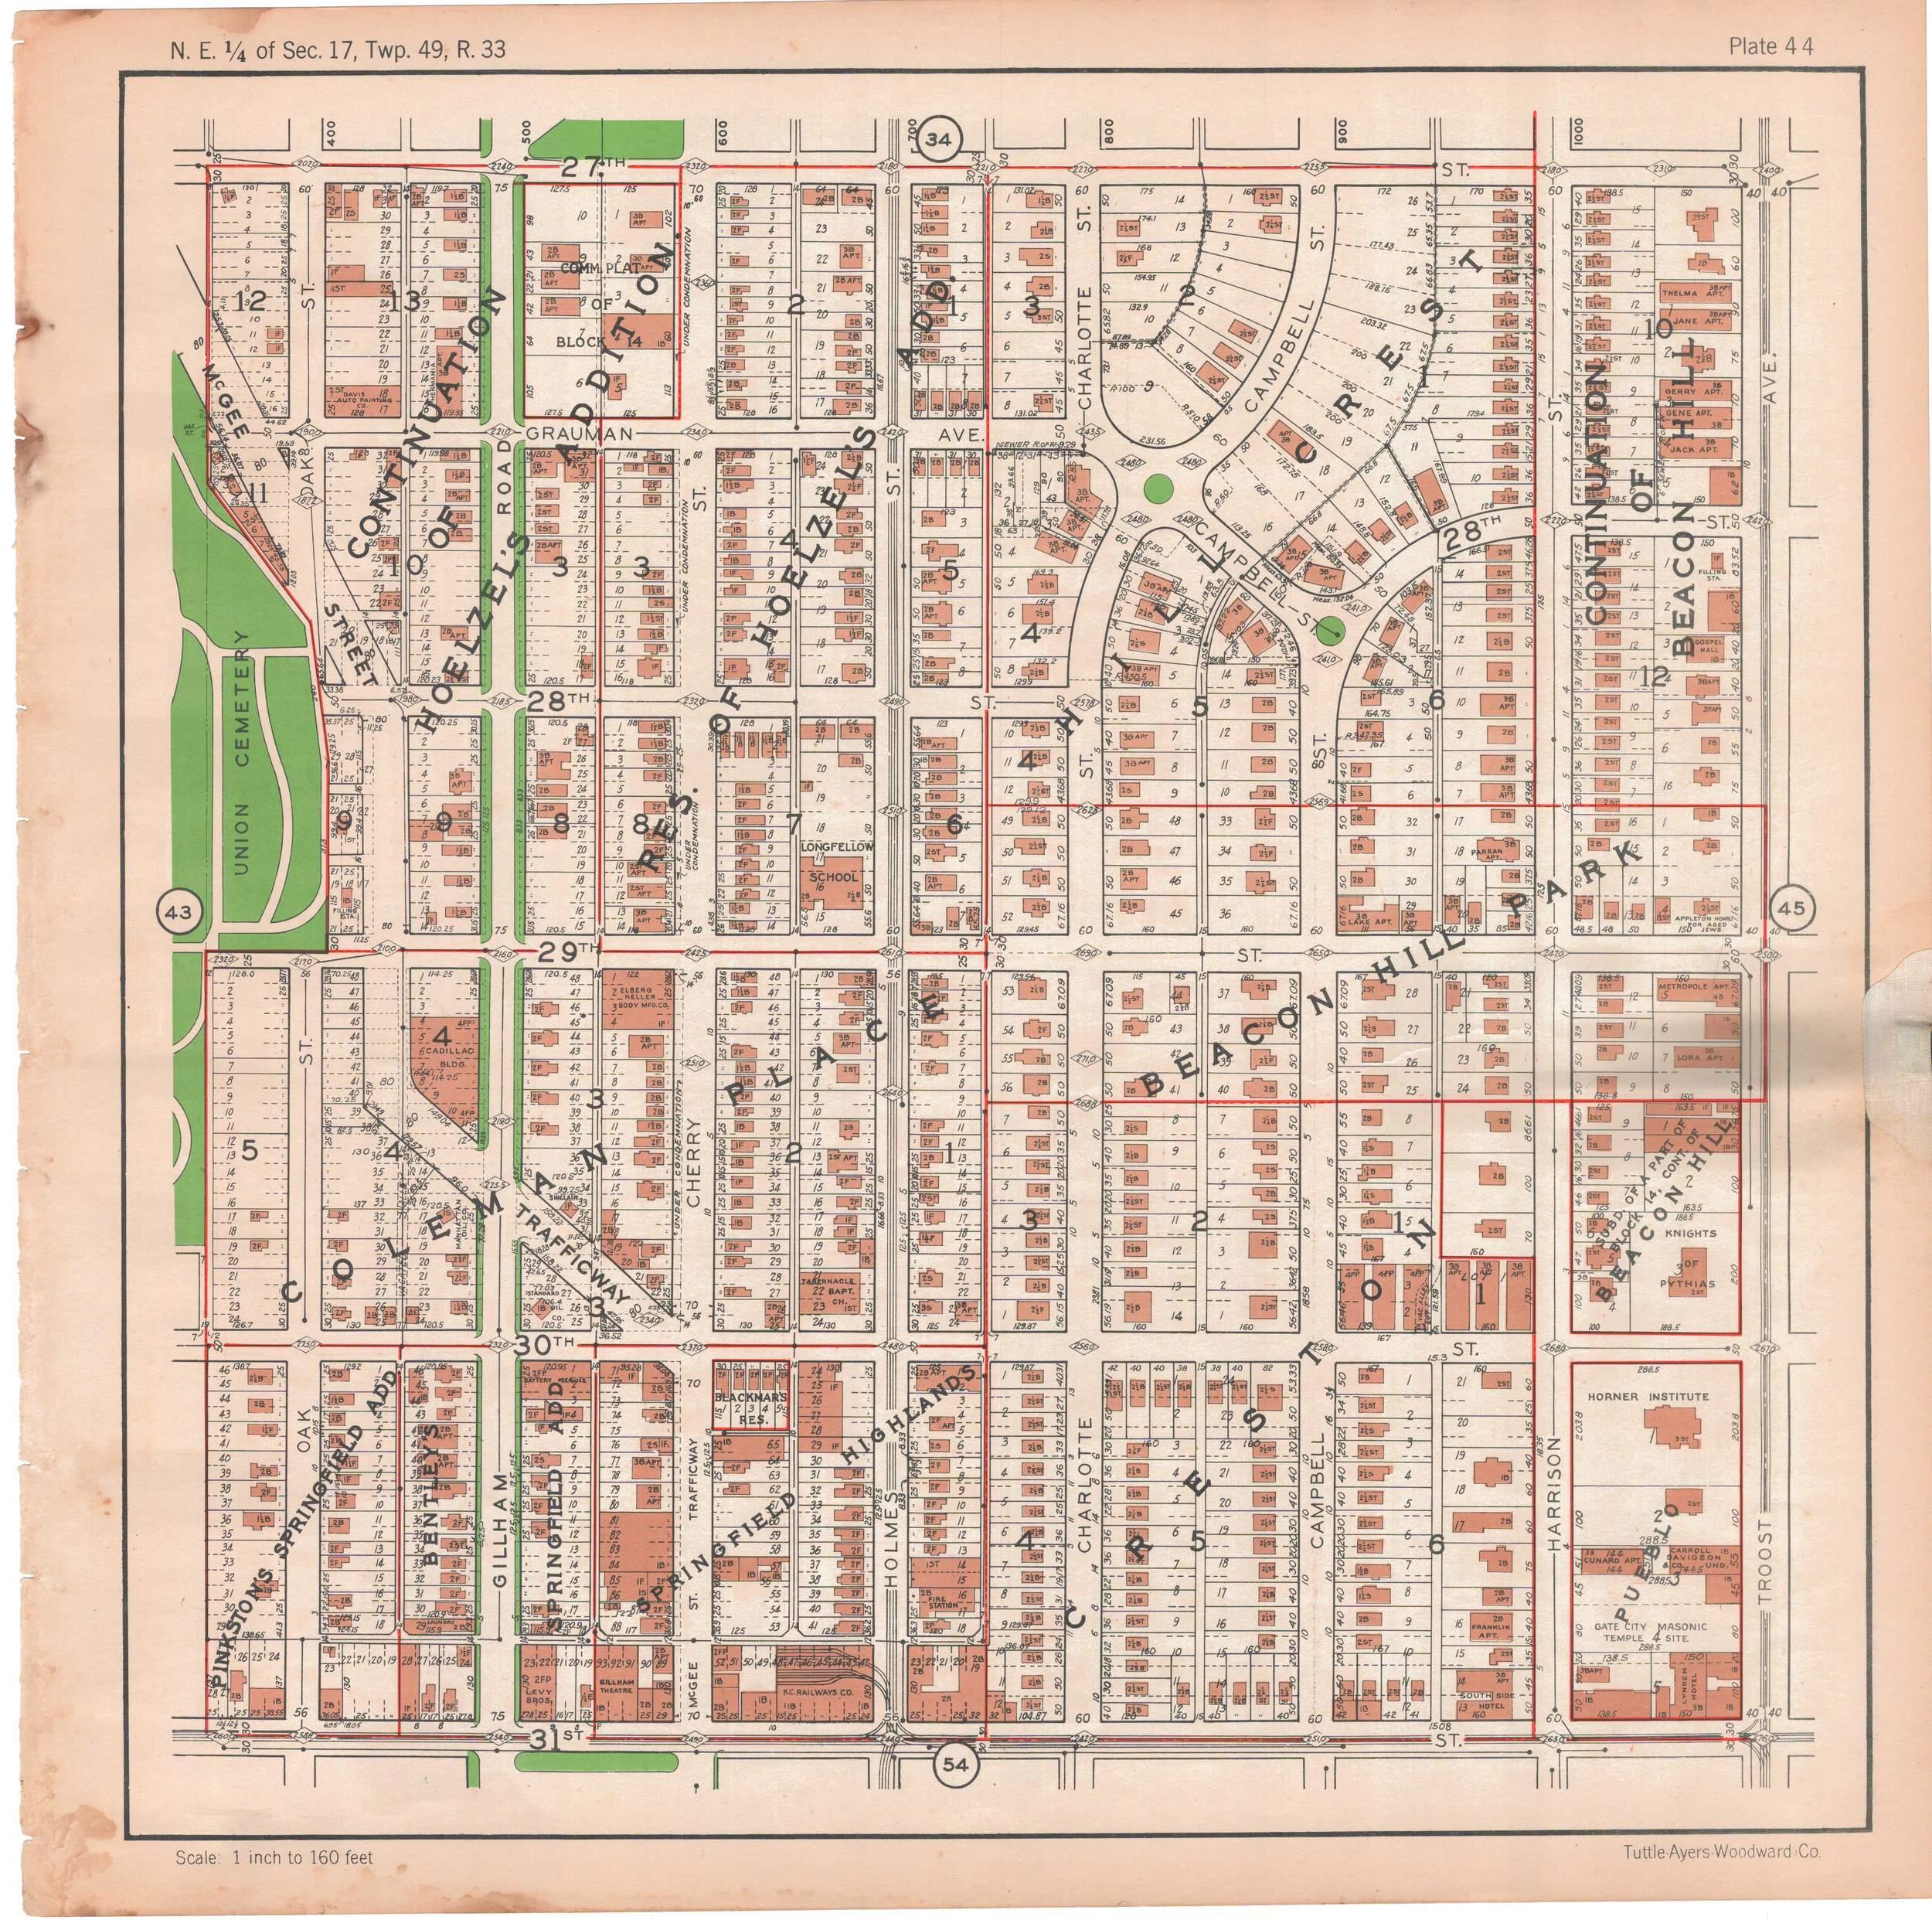 1925 TUTTLE_AYERS_Plate 44.JPG